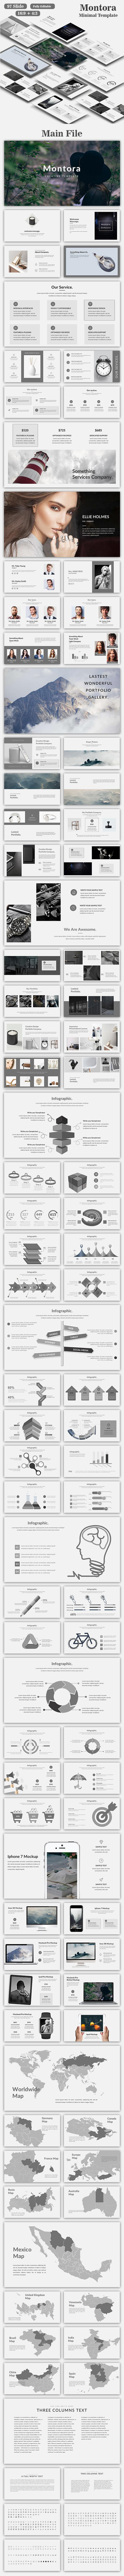 Montora Minimal Google Slide Template - Google Slides Presentation Templates